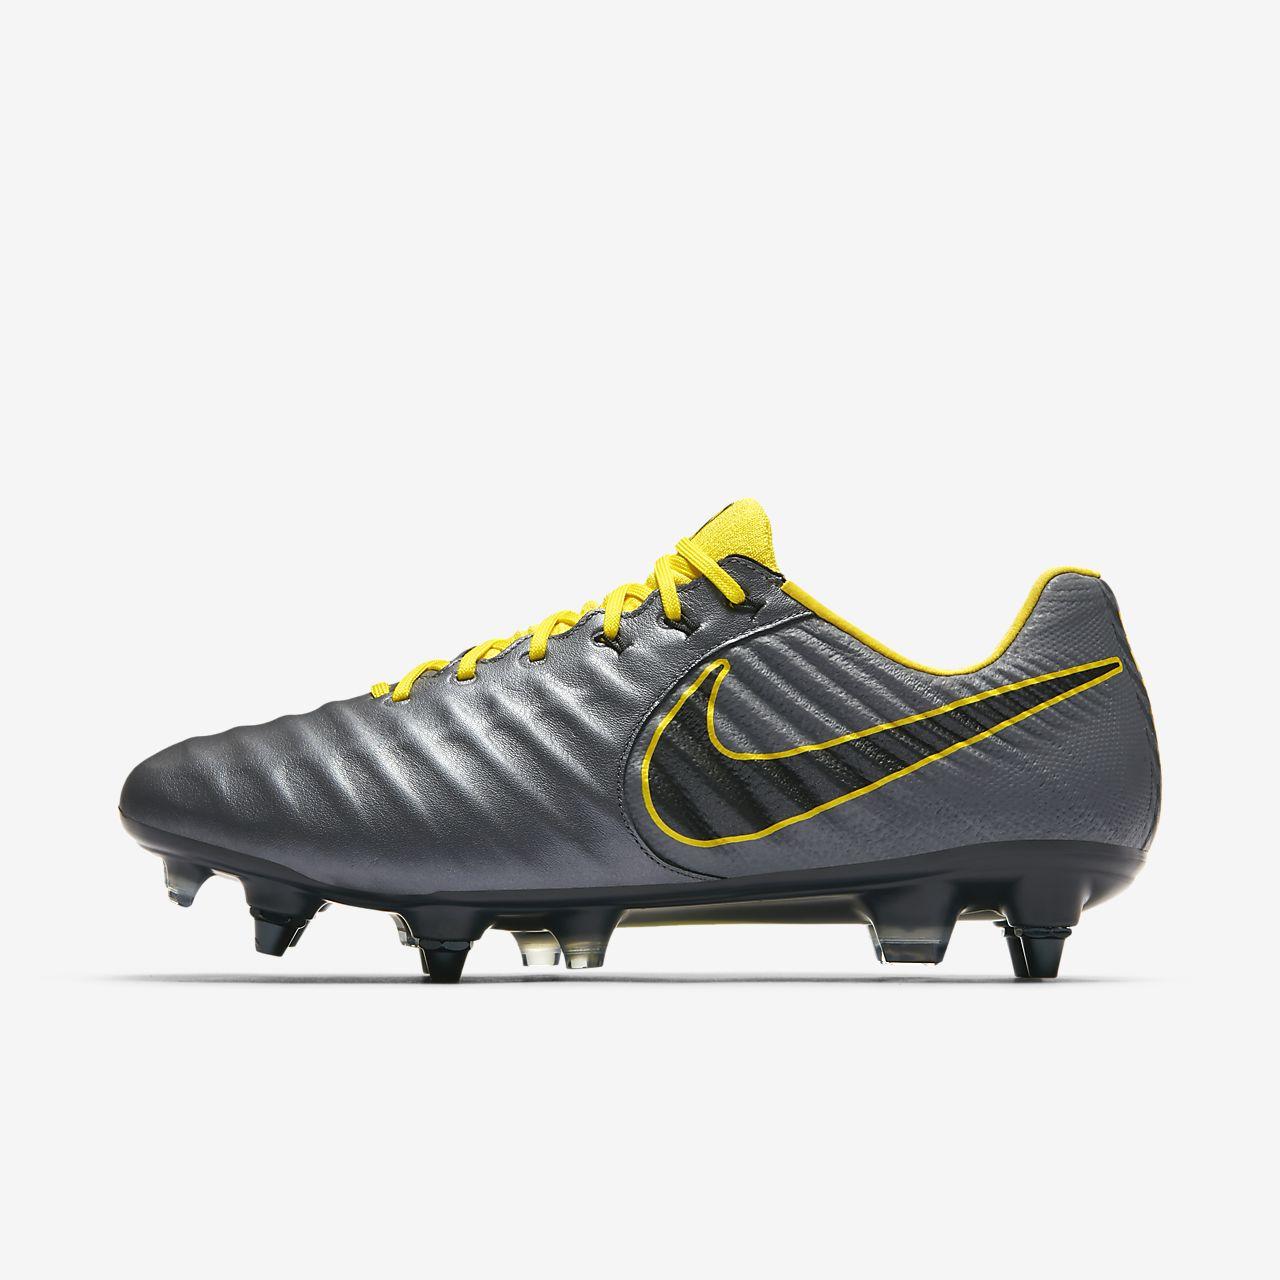 66024e54999a6 ... Calzado de fútbol para terreno blando Nike Tiempo Legend VII Elite SG- Pro Anti-